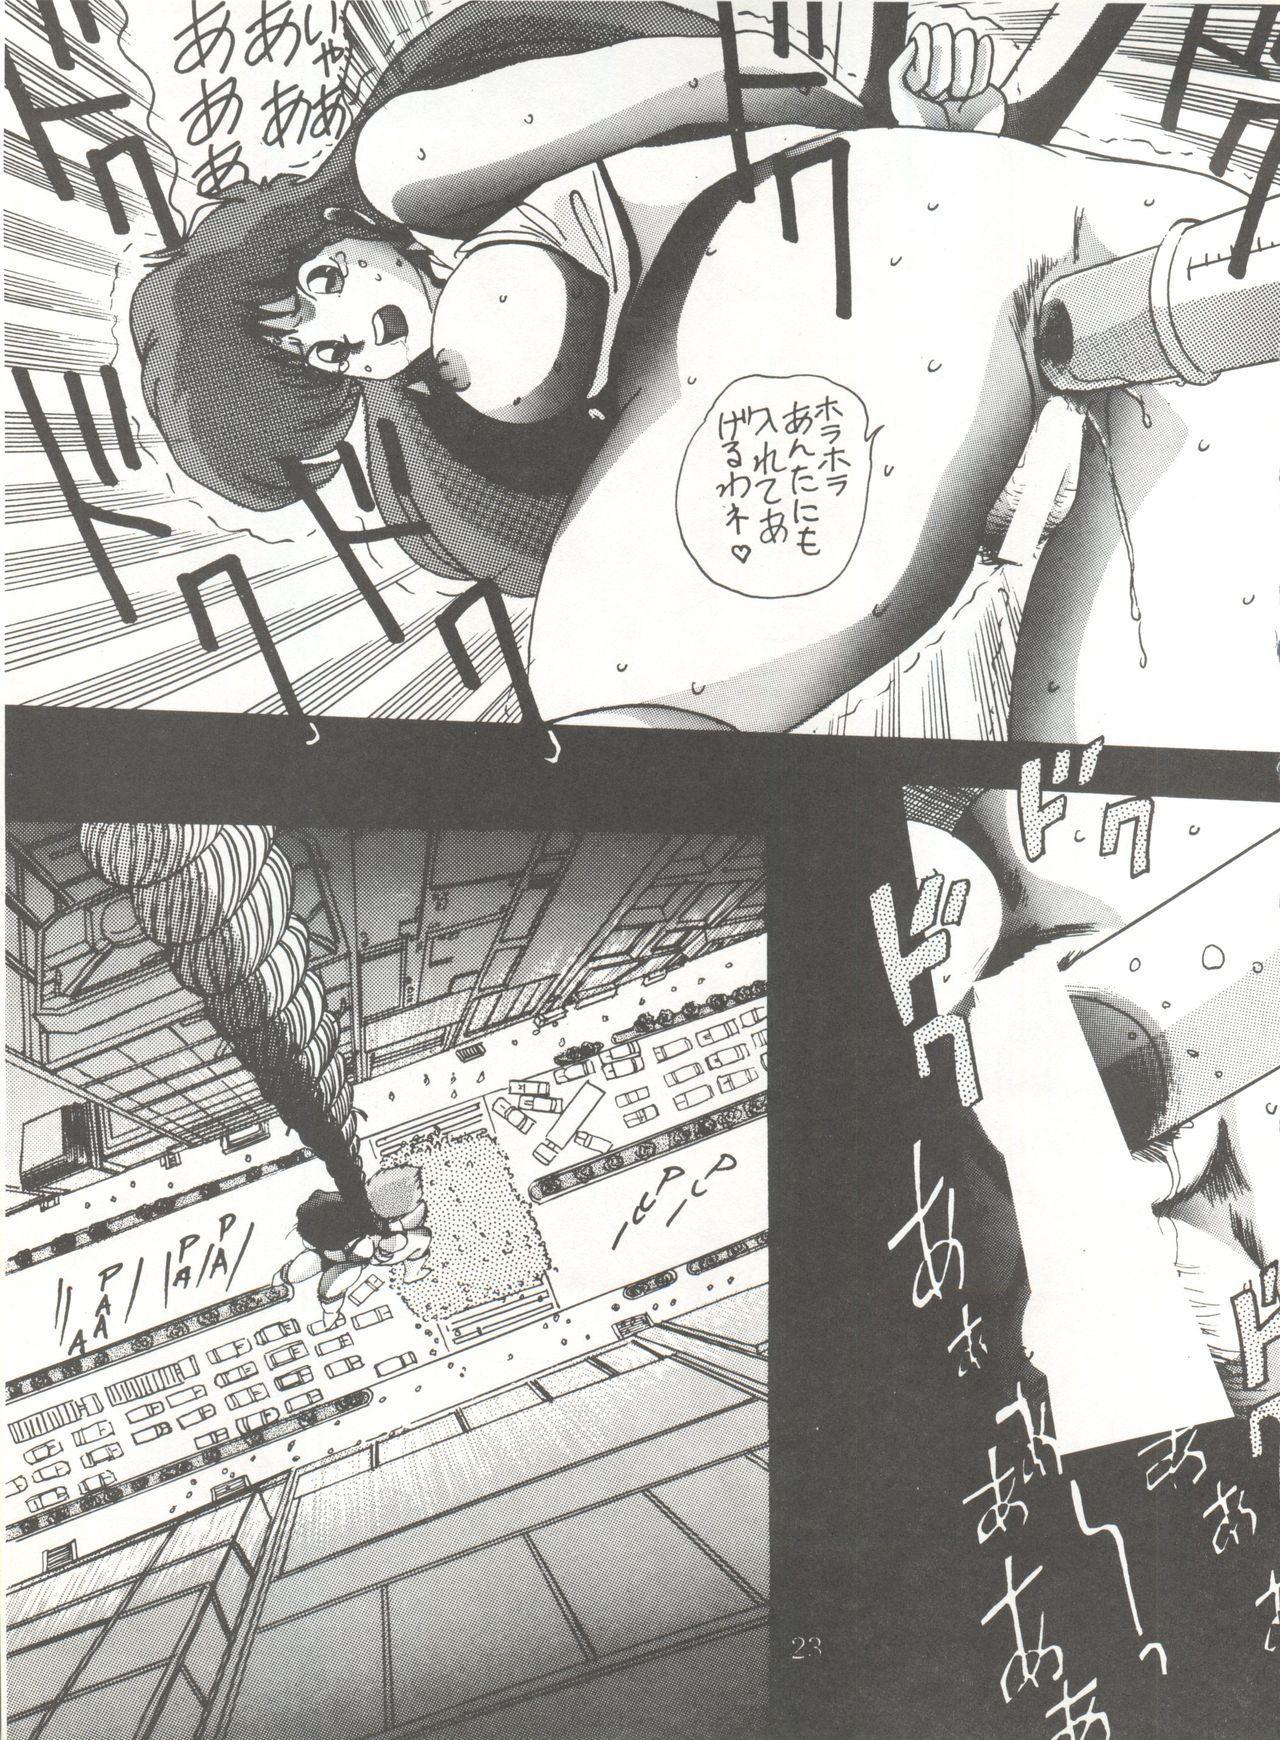 [Global One (MARO)] Sadistic 5 (Cutey Honey, Devilman, Sailor Moon), [Global One (MARO)] Sadistic (Dirty Pair, Fushigi no Umi no Nadia, Sailor Moon), [Studio Ikkatsumajin] .ribbon (Hime-chan's Ribbon) 82